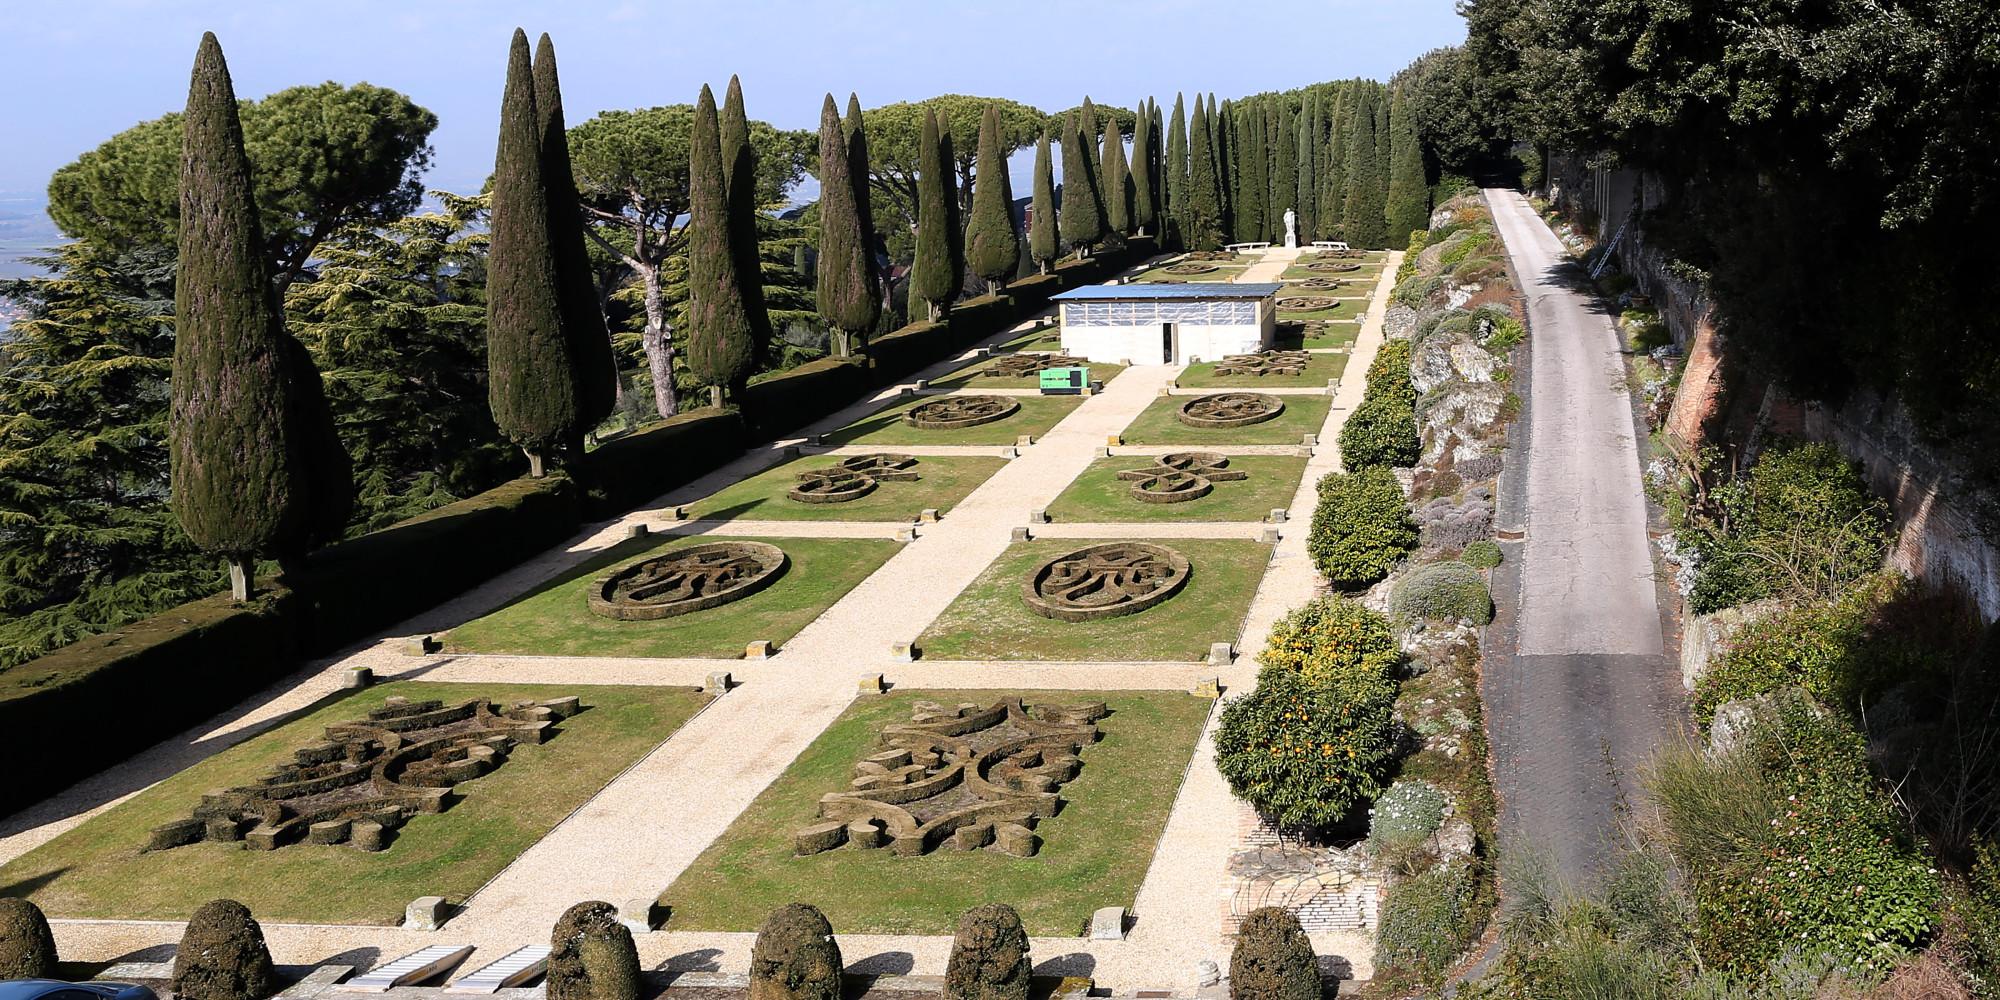 Pope Francis Opens Castel Gandolfo Barberini Gardens To